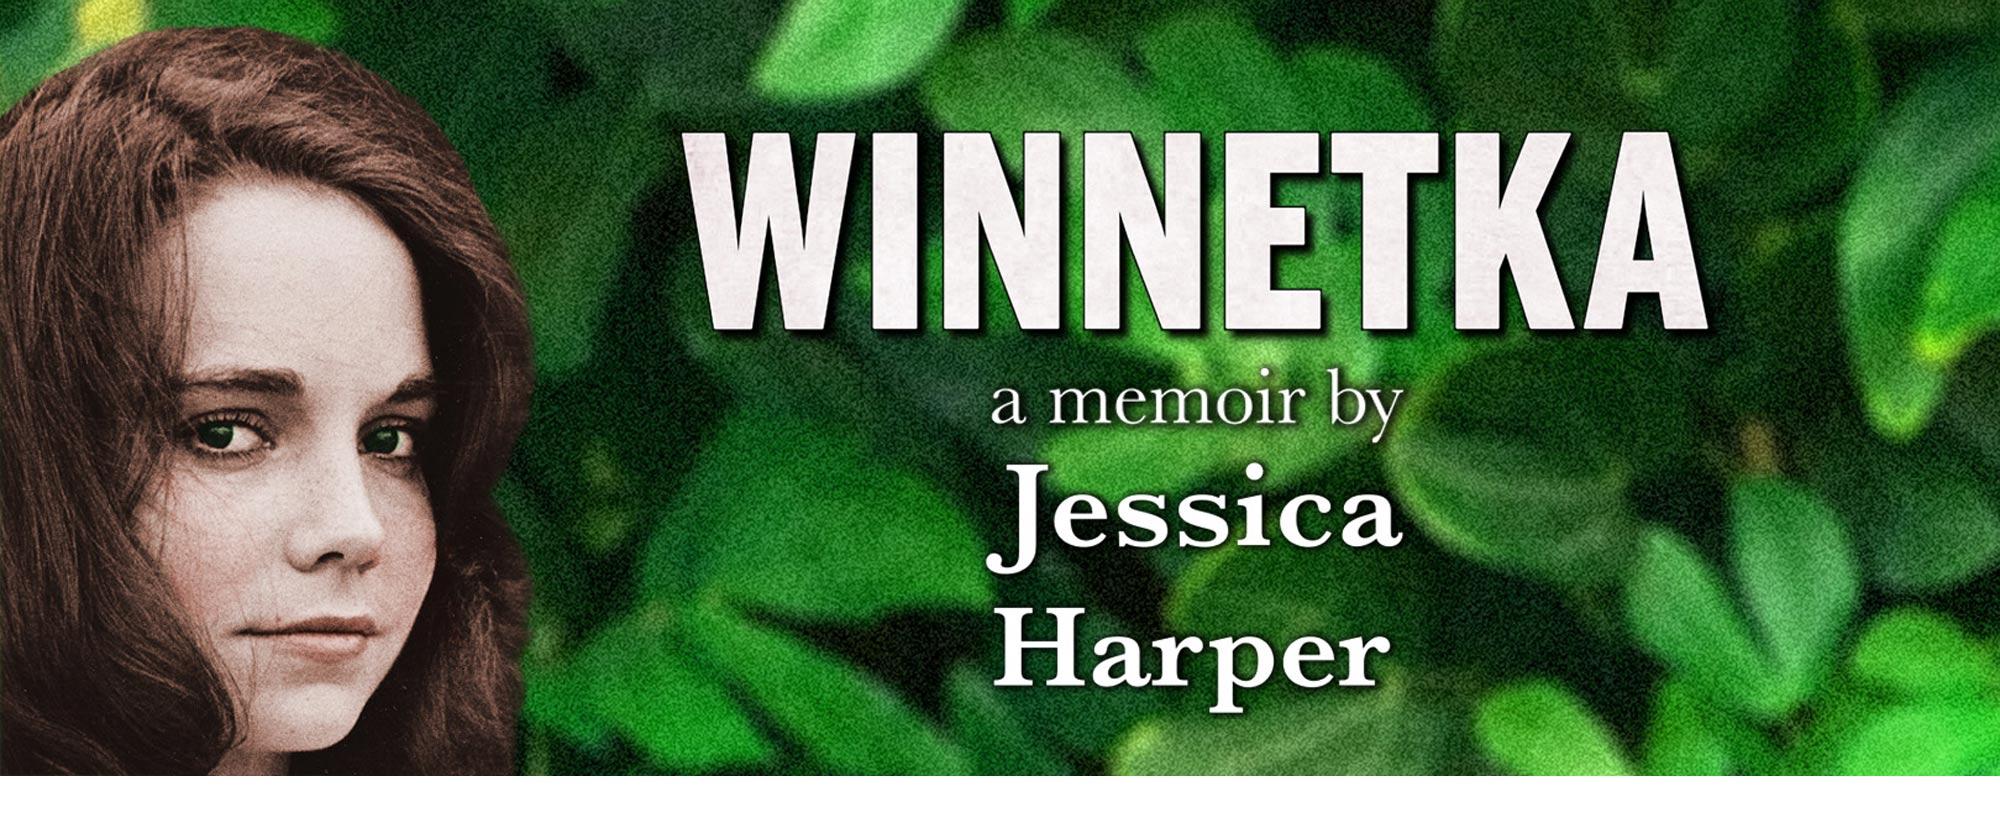 WINNETKA a memoir by Jessica Harper